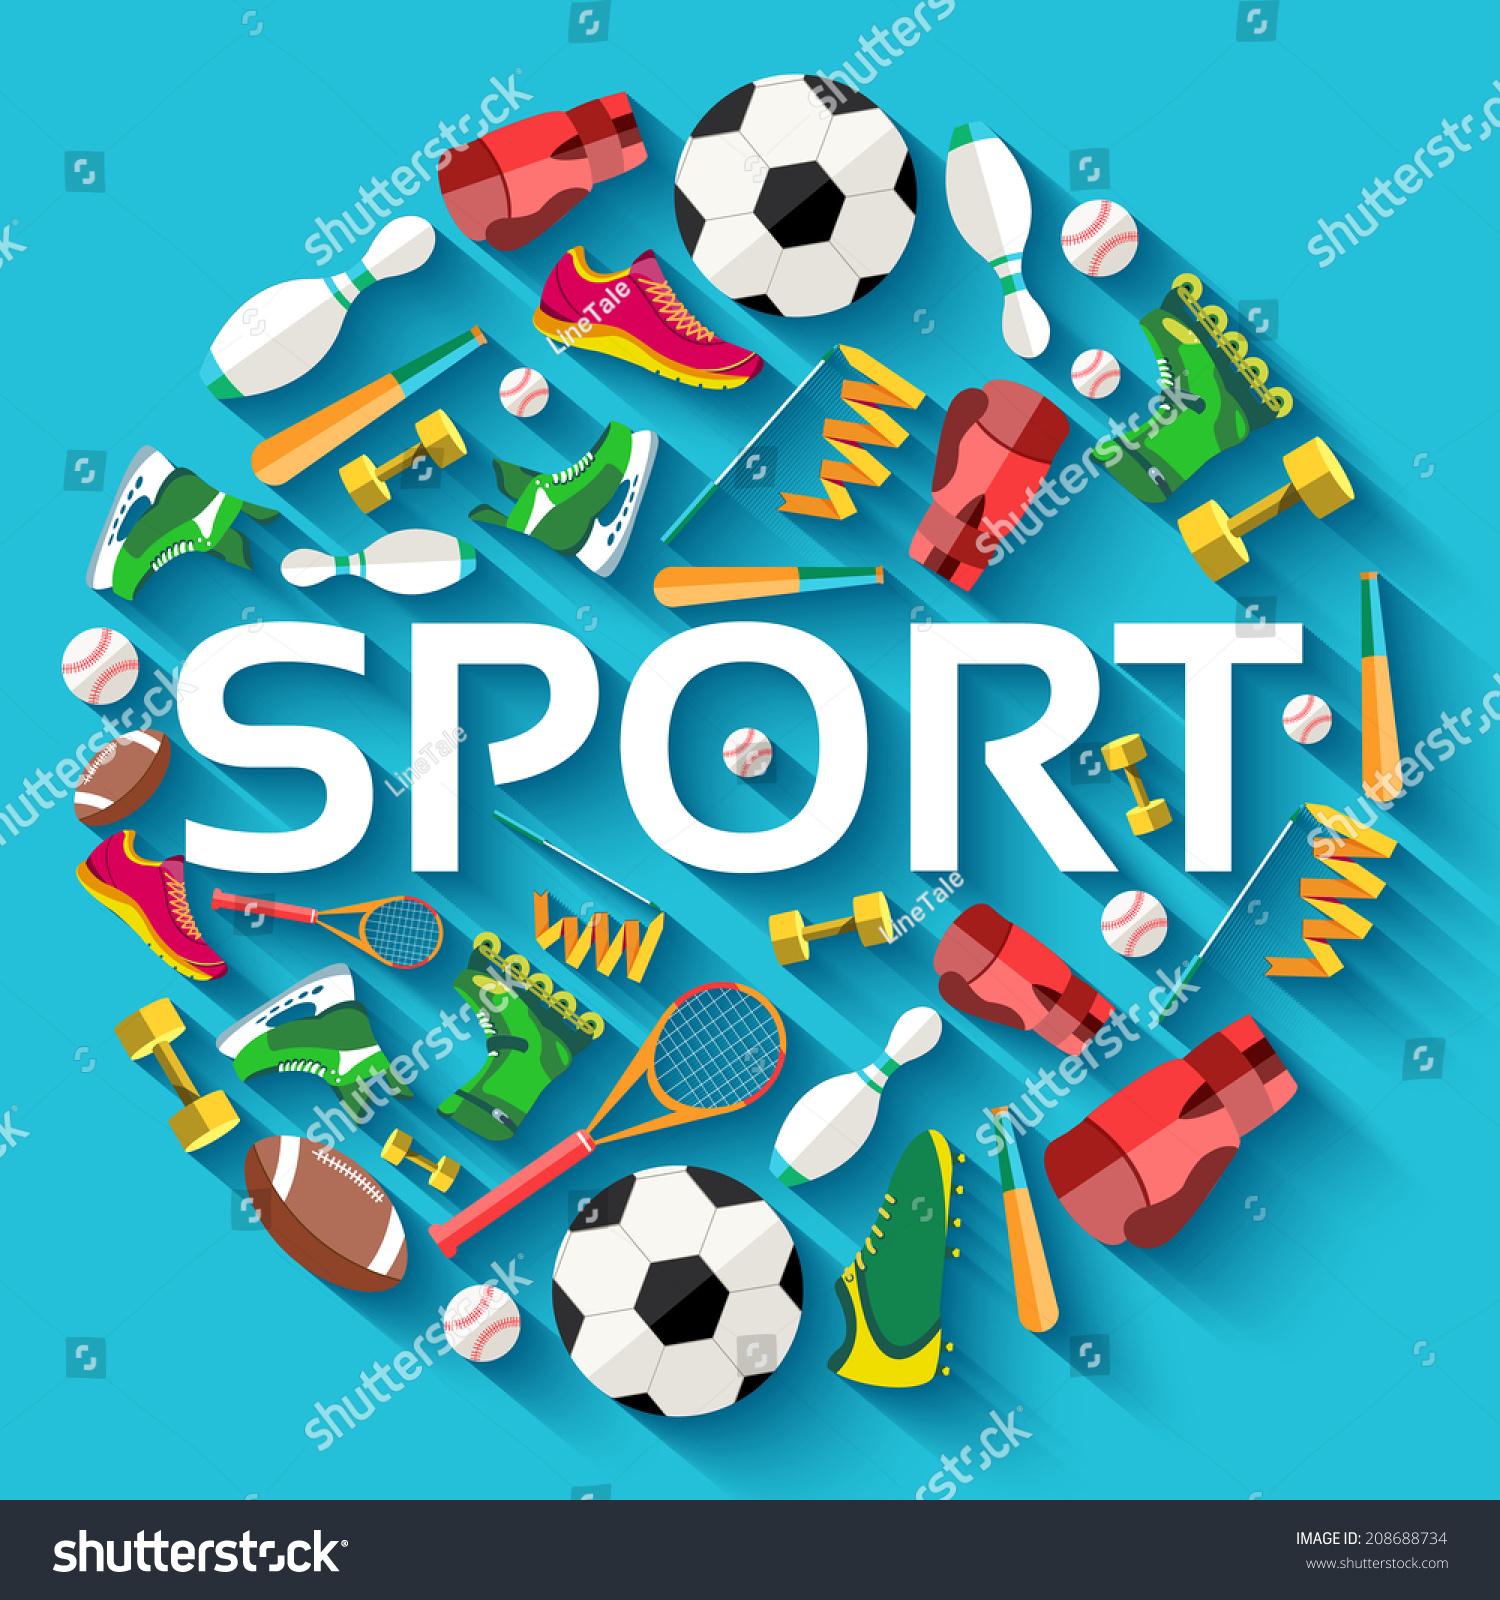 sports background designs - photo #41